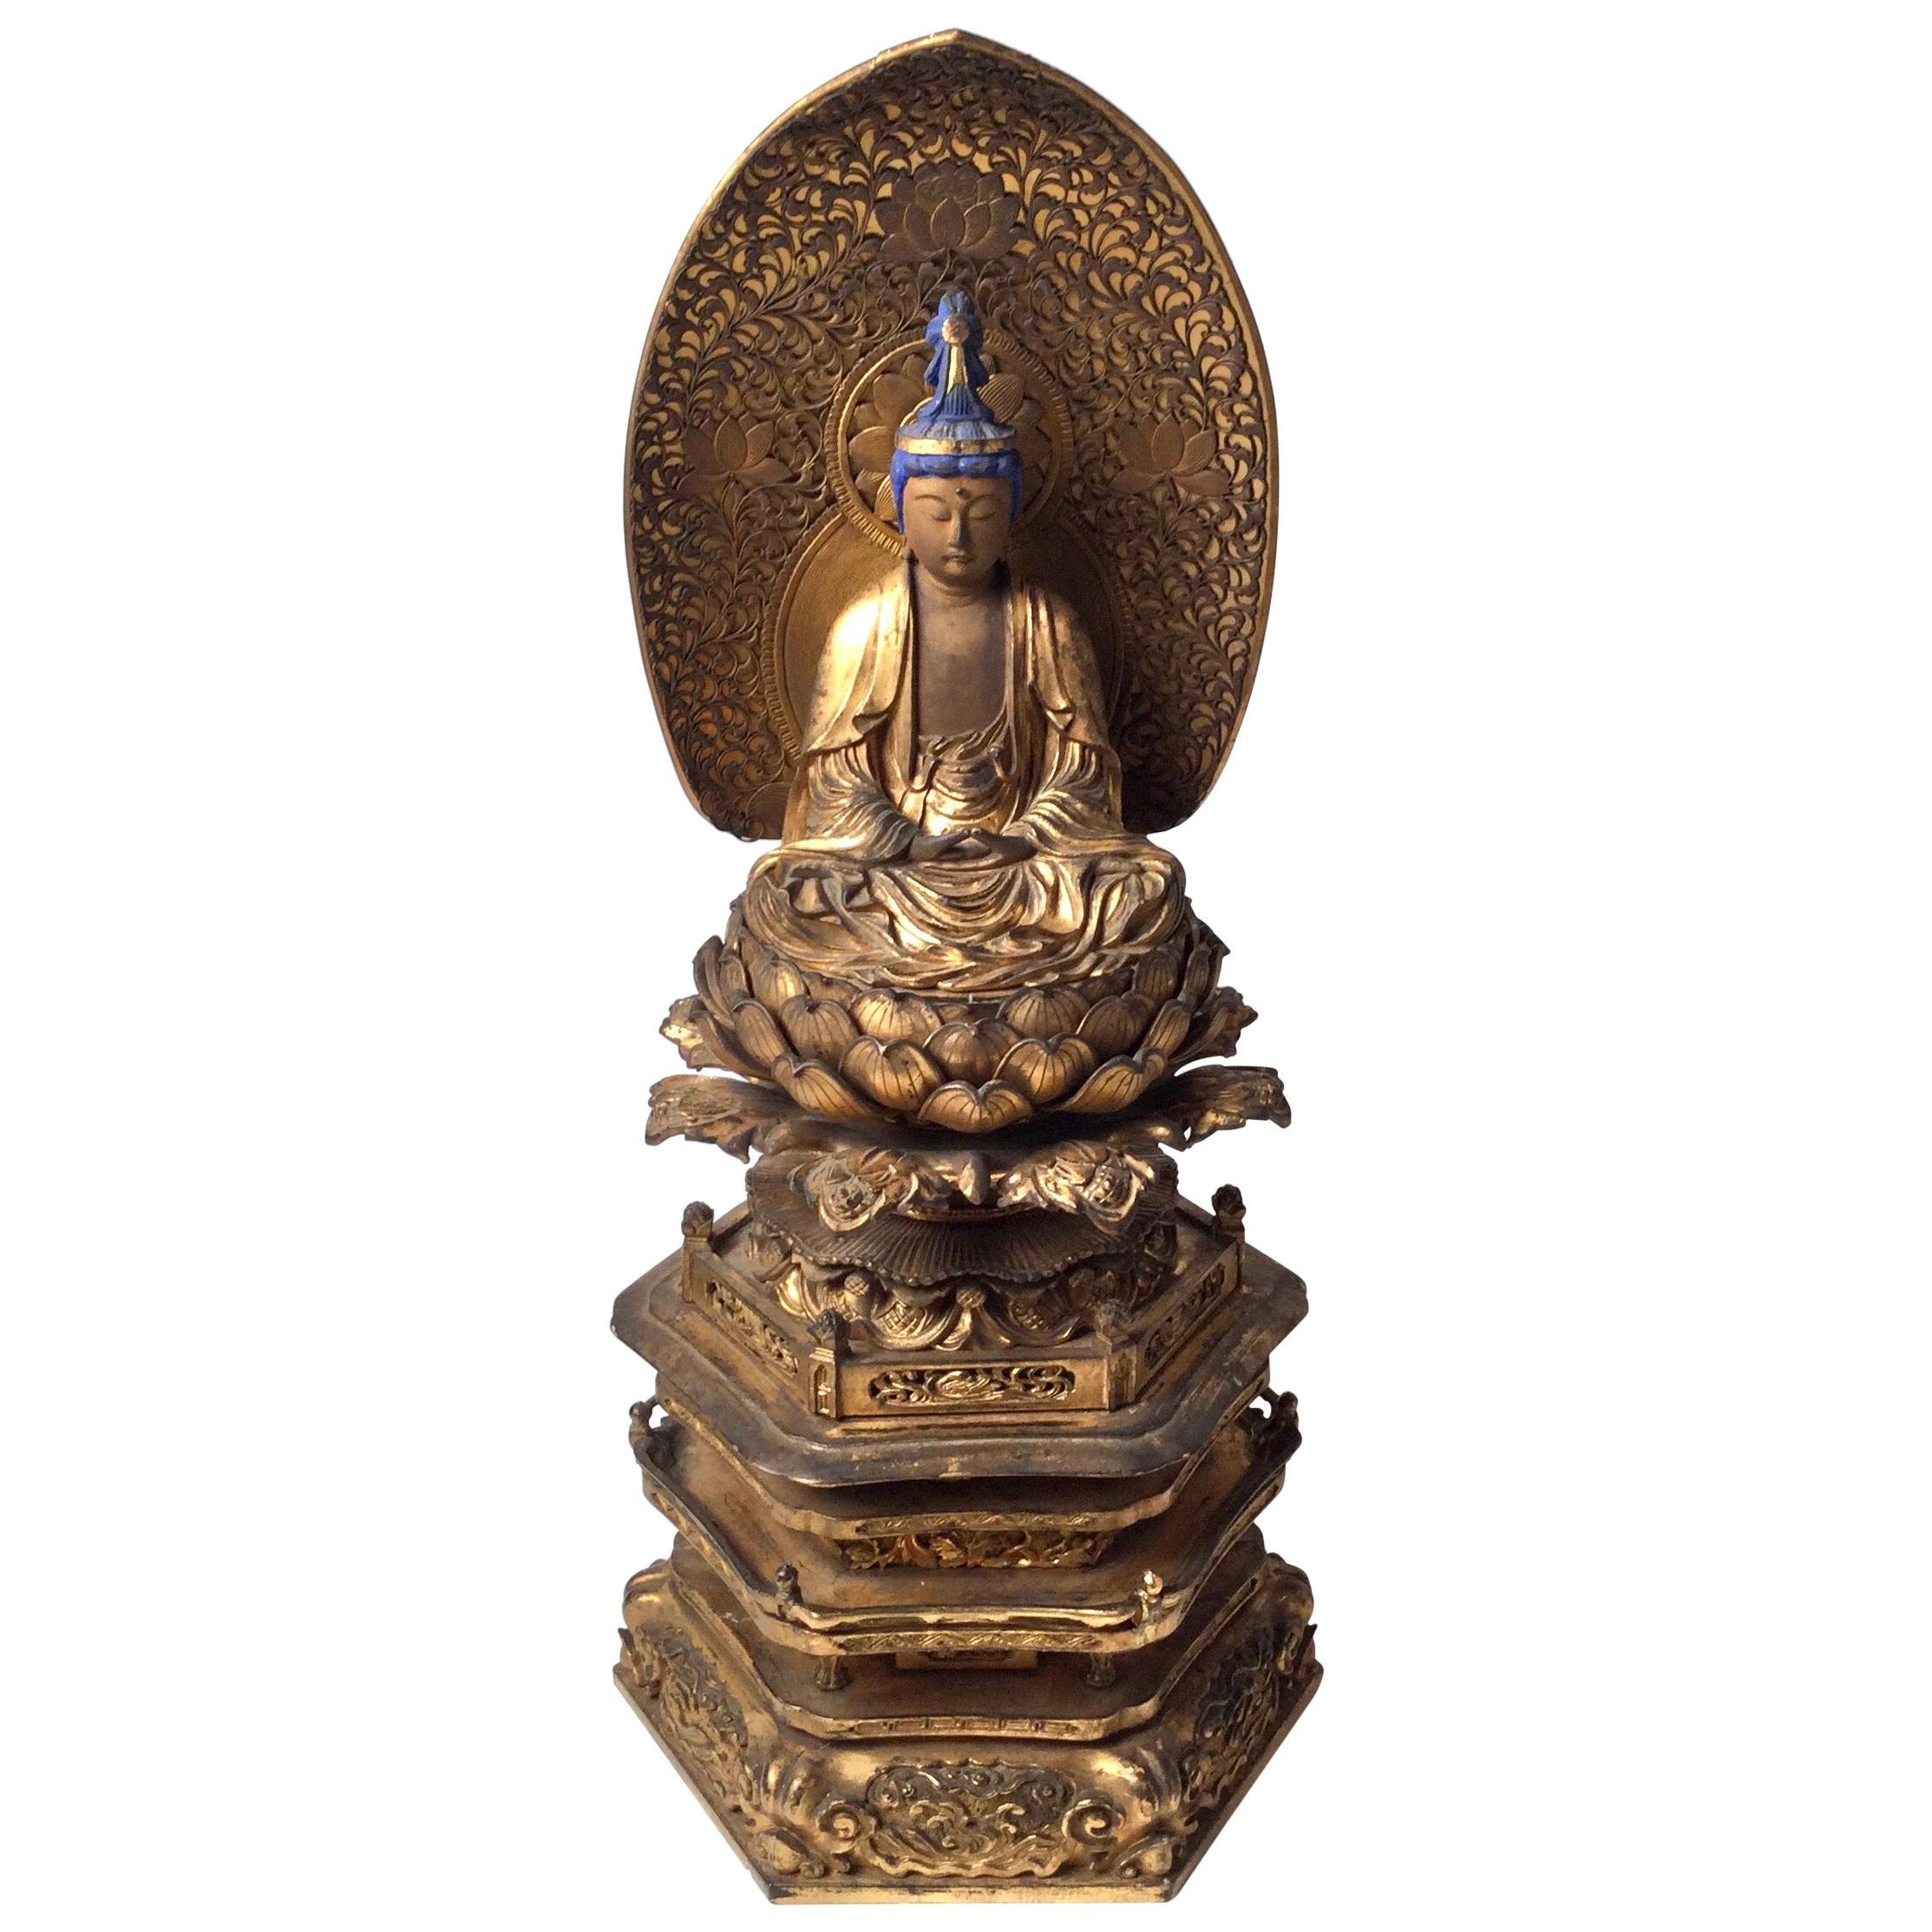 19th Century Japanese Carved Wood Polychromed Shrine Buddha